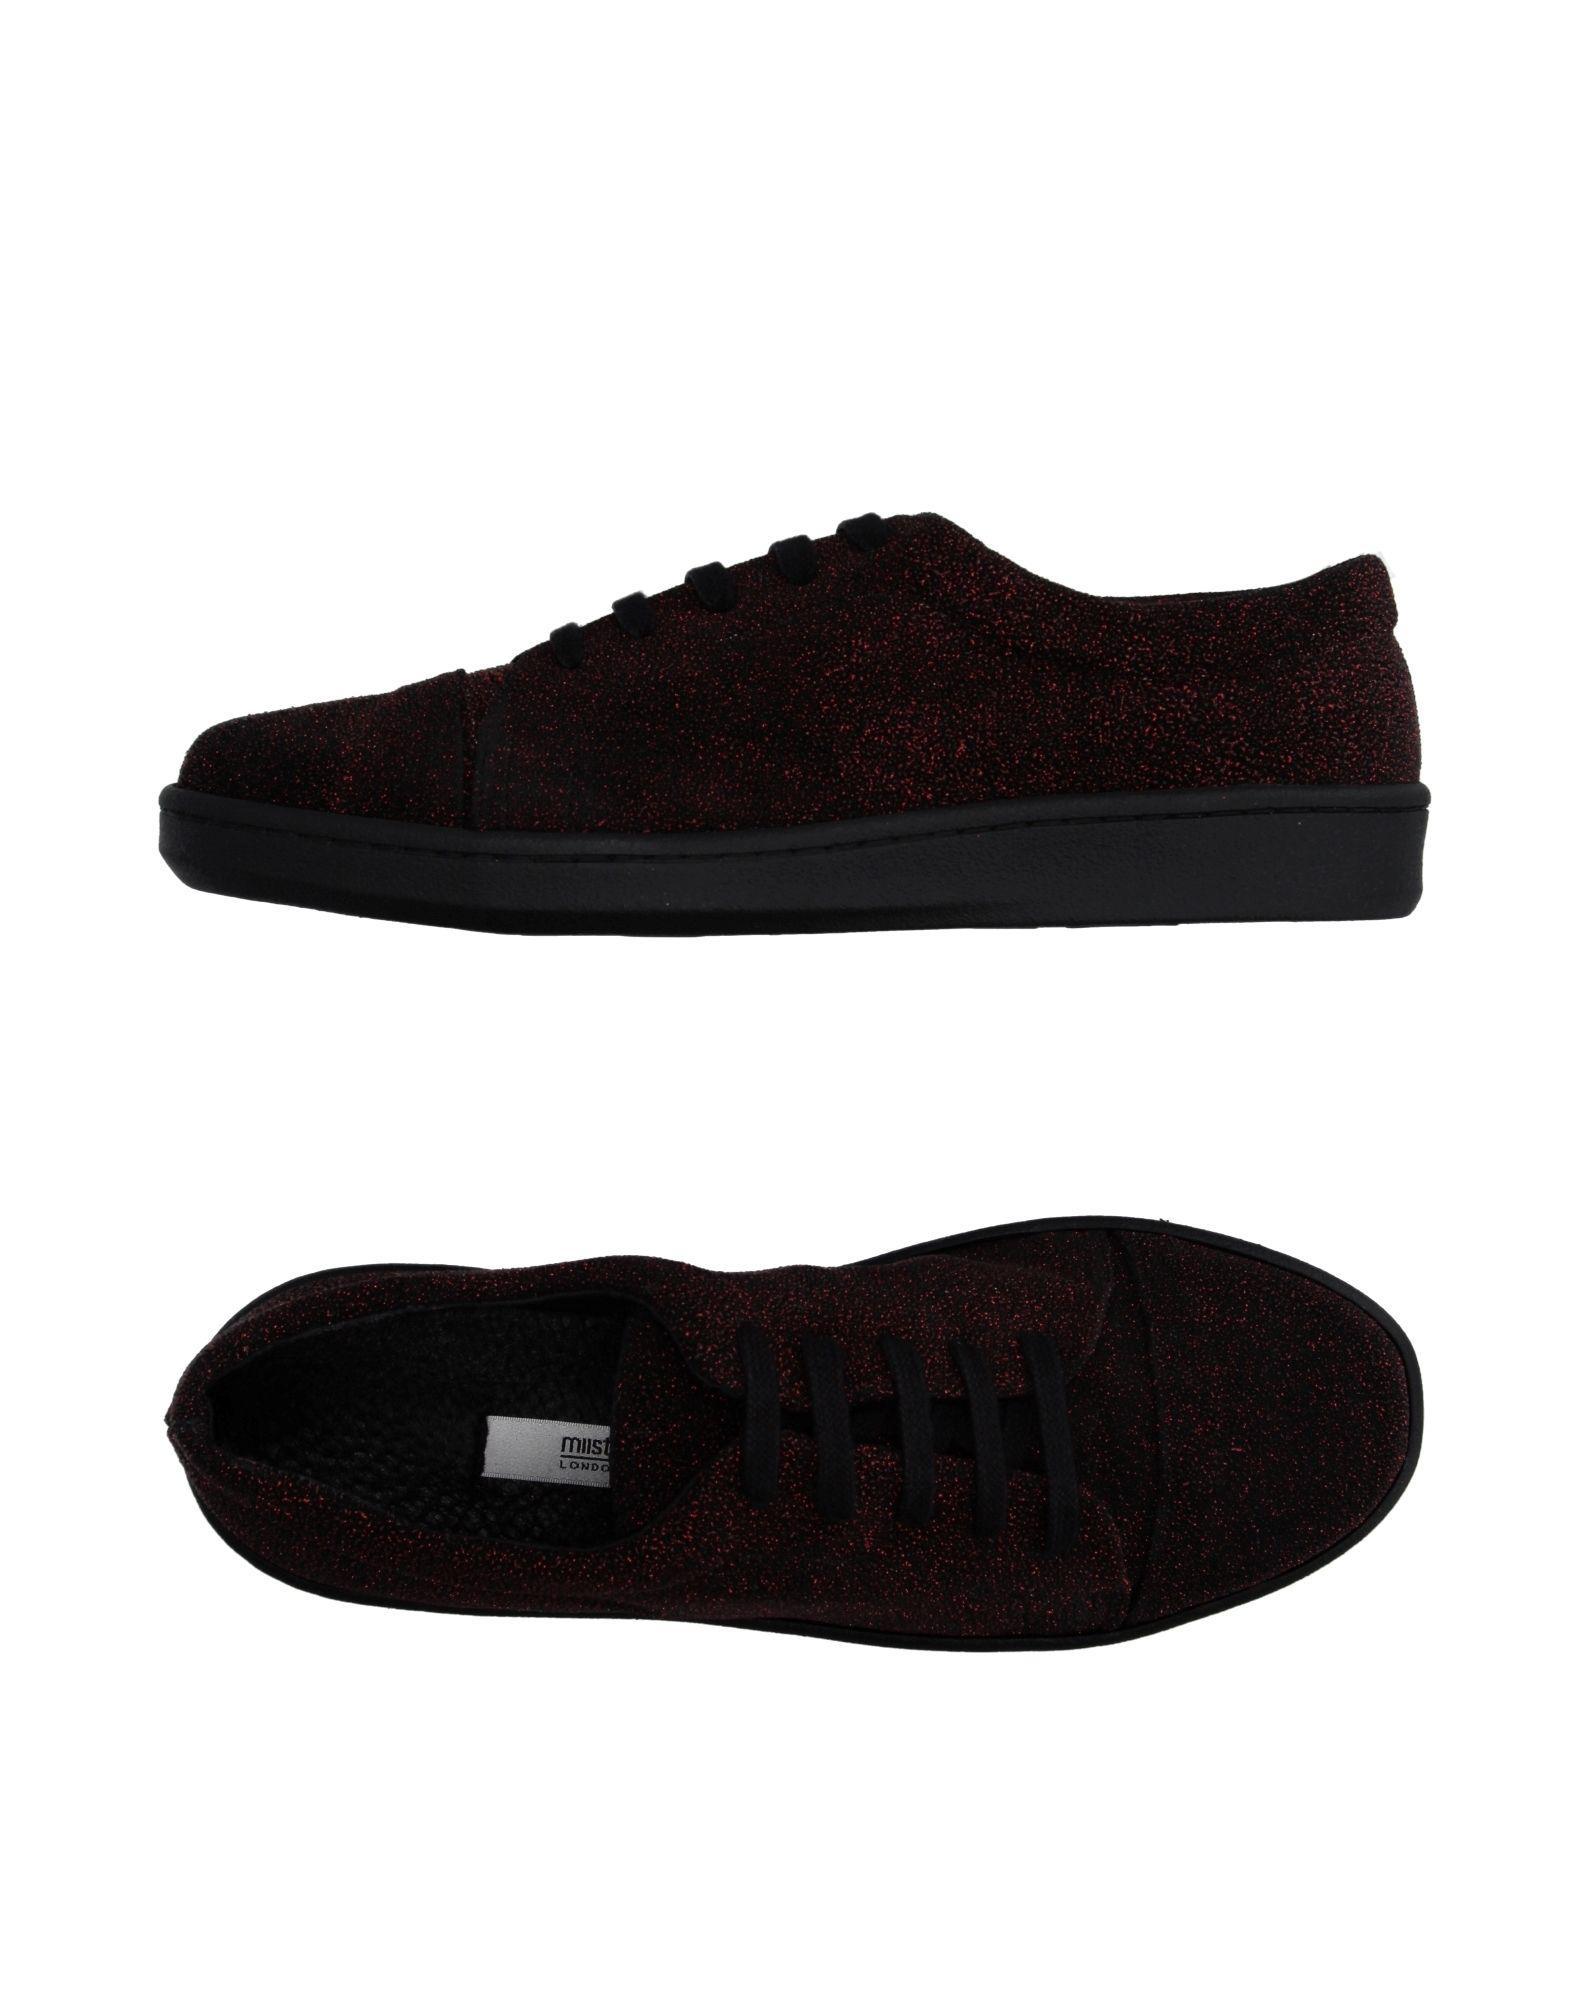 FOOTWEAR - Low-tops & sneakers Miista zNkTyfSdm